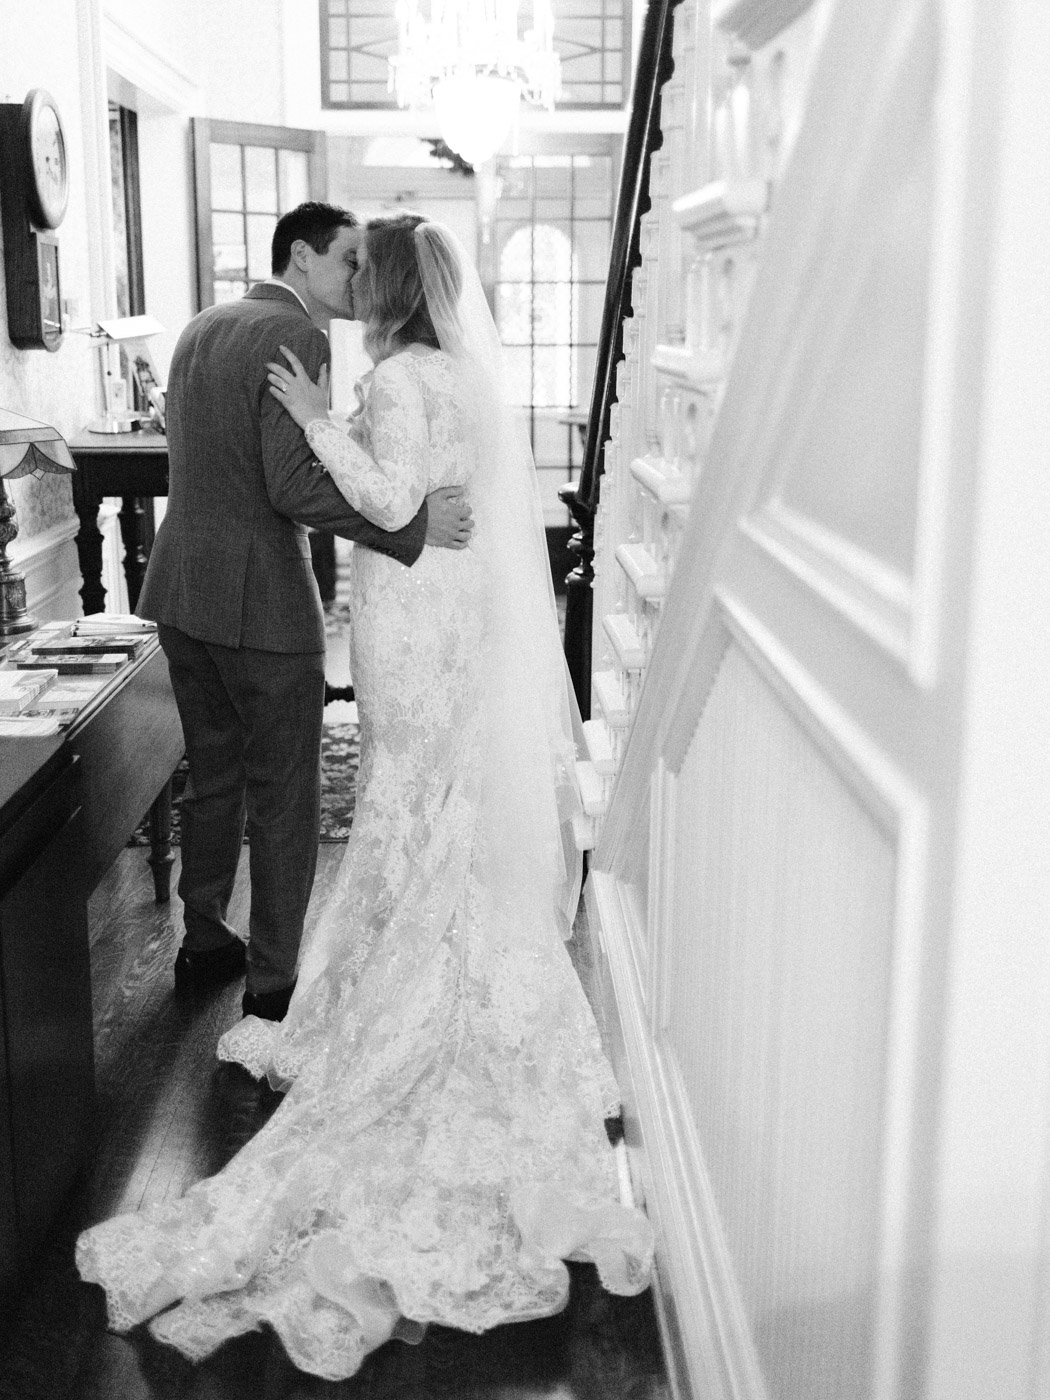 Toronto-wedding-photographer-intimate-classic-fine-art-elopement-ottawa36.jpg